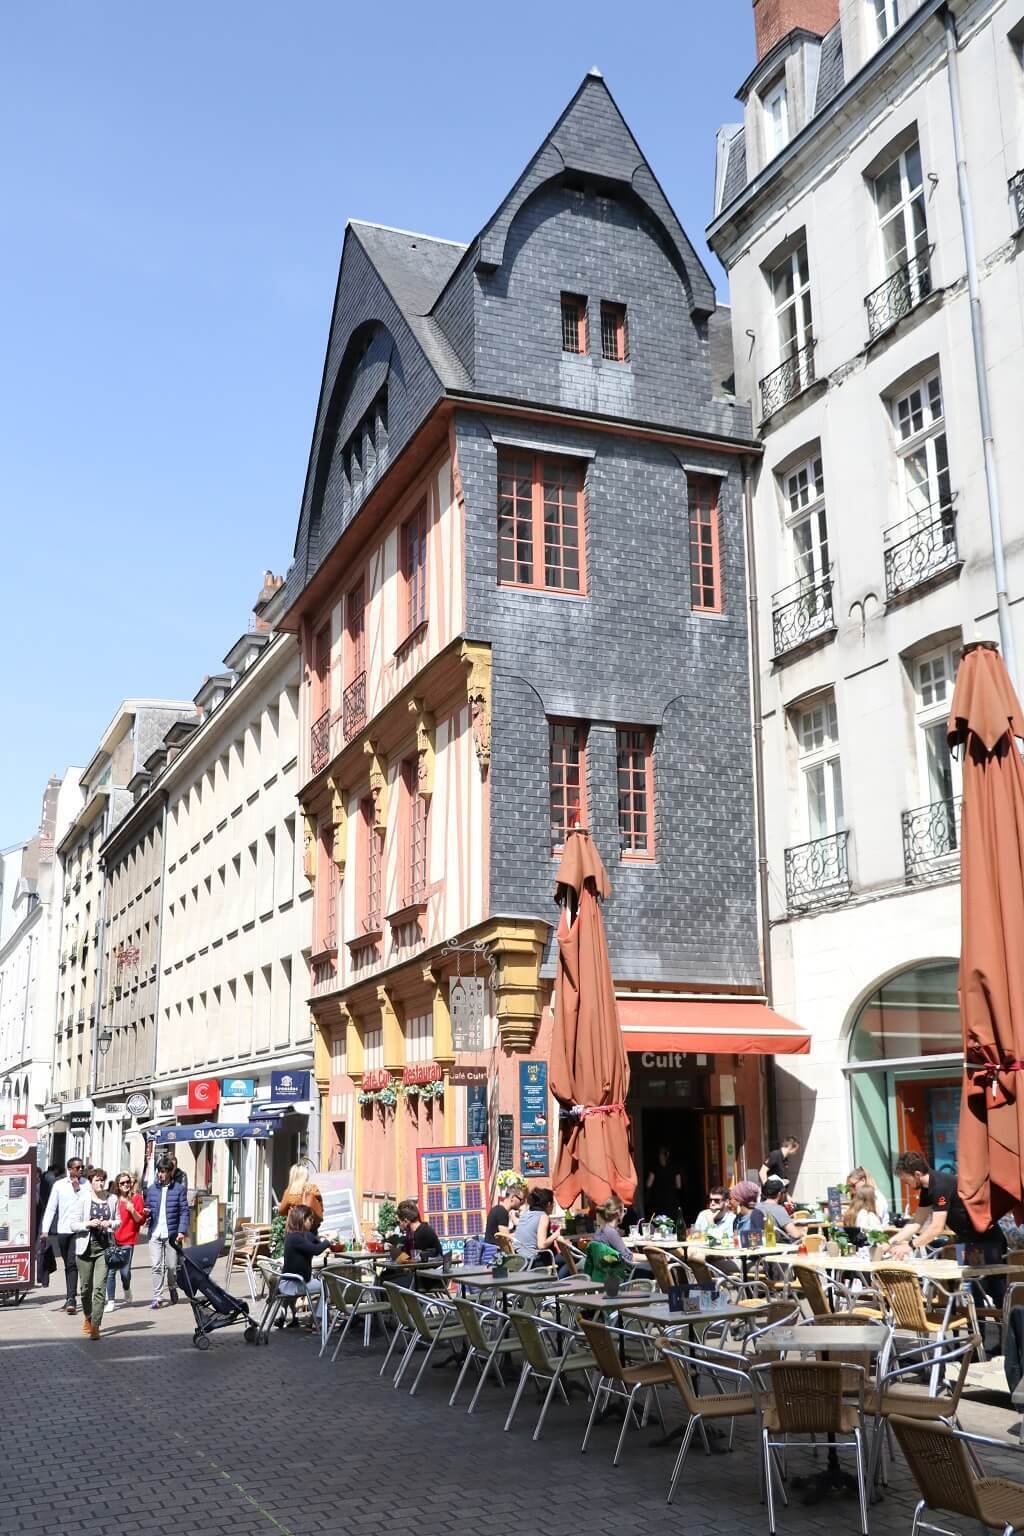 Nantes rue immeuble pan de bois